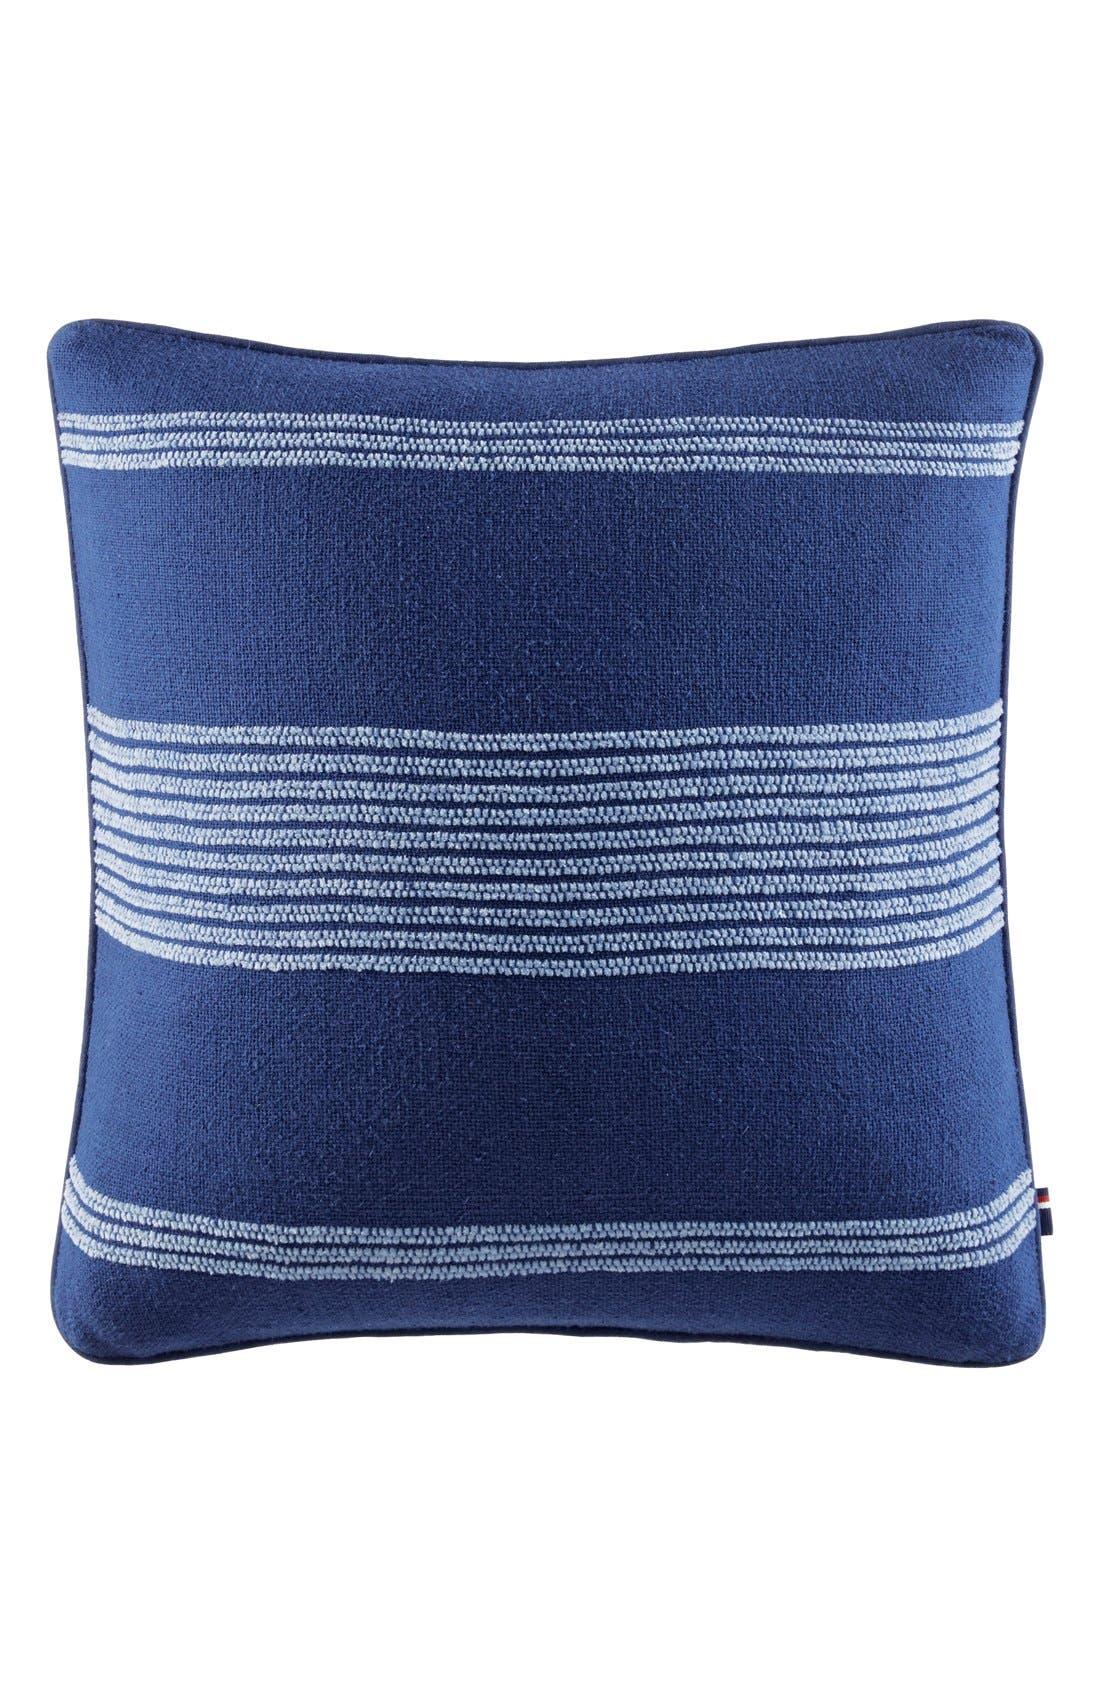 Pacific Horizon Accent Pillow,                         Main,                         color, 400